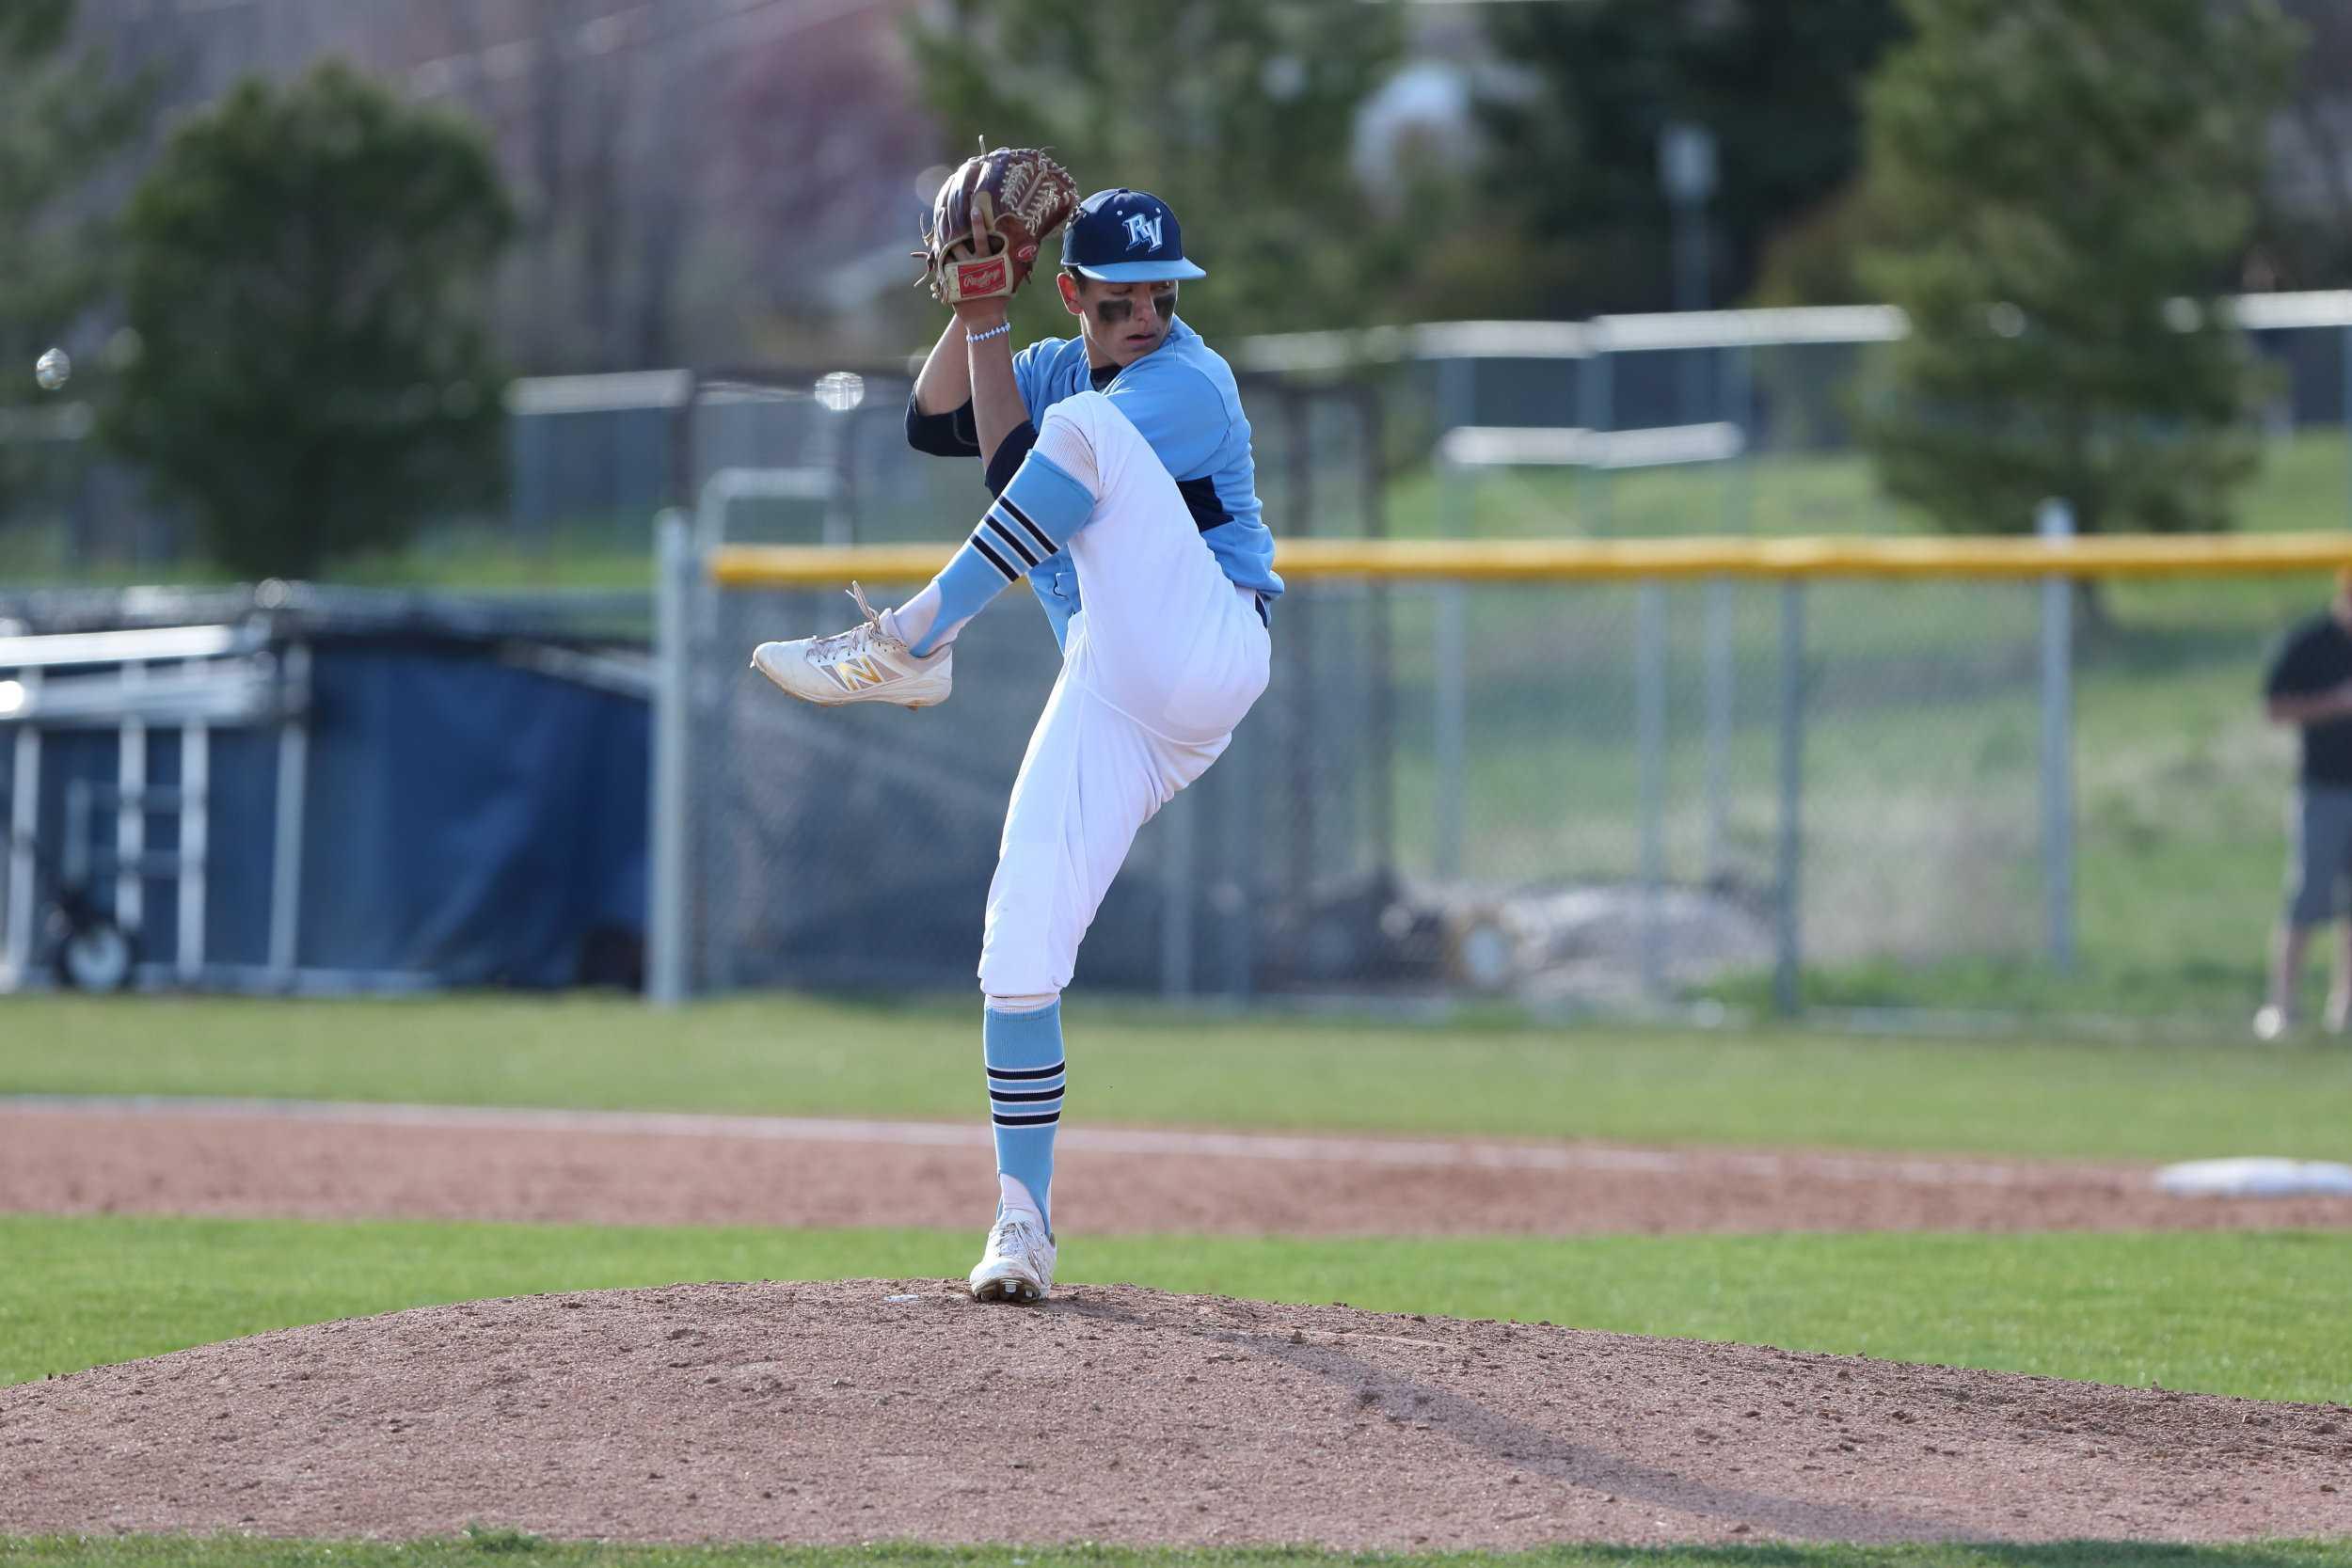 RV senior Drake Davis made the decision to focus on a single sport, and success on the baseball diamond helped him land a scholarship to Arizona State University.